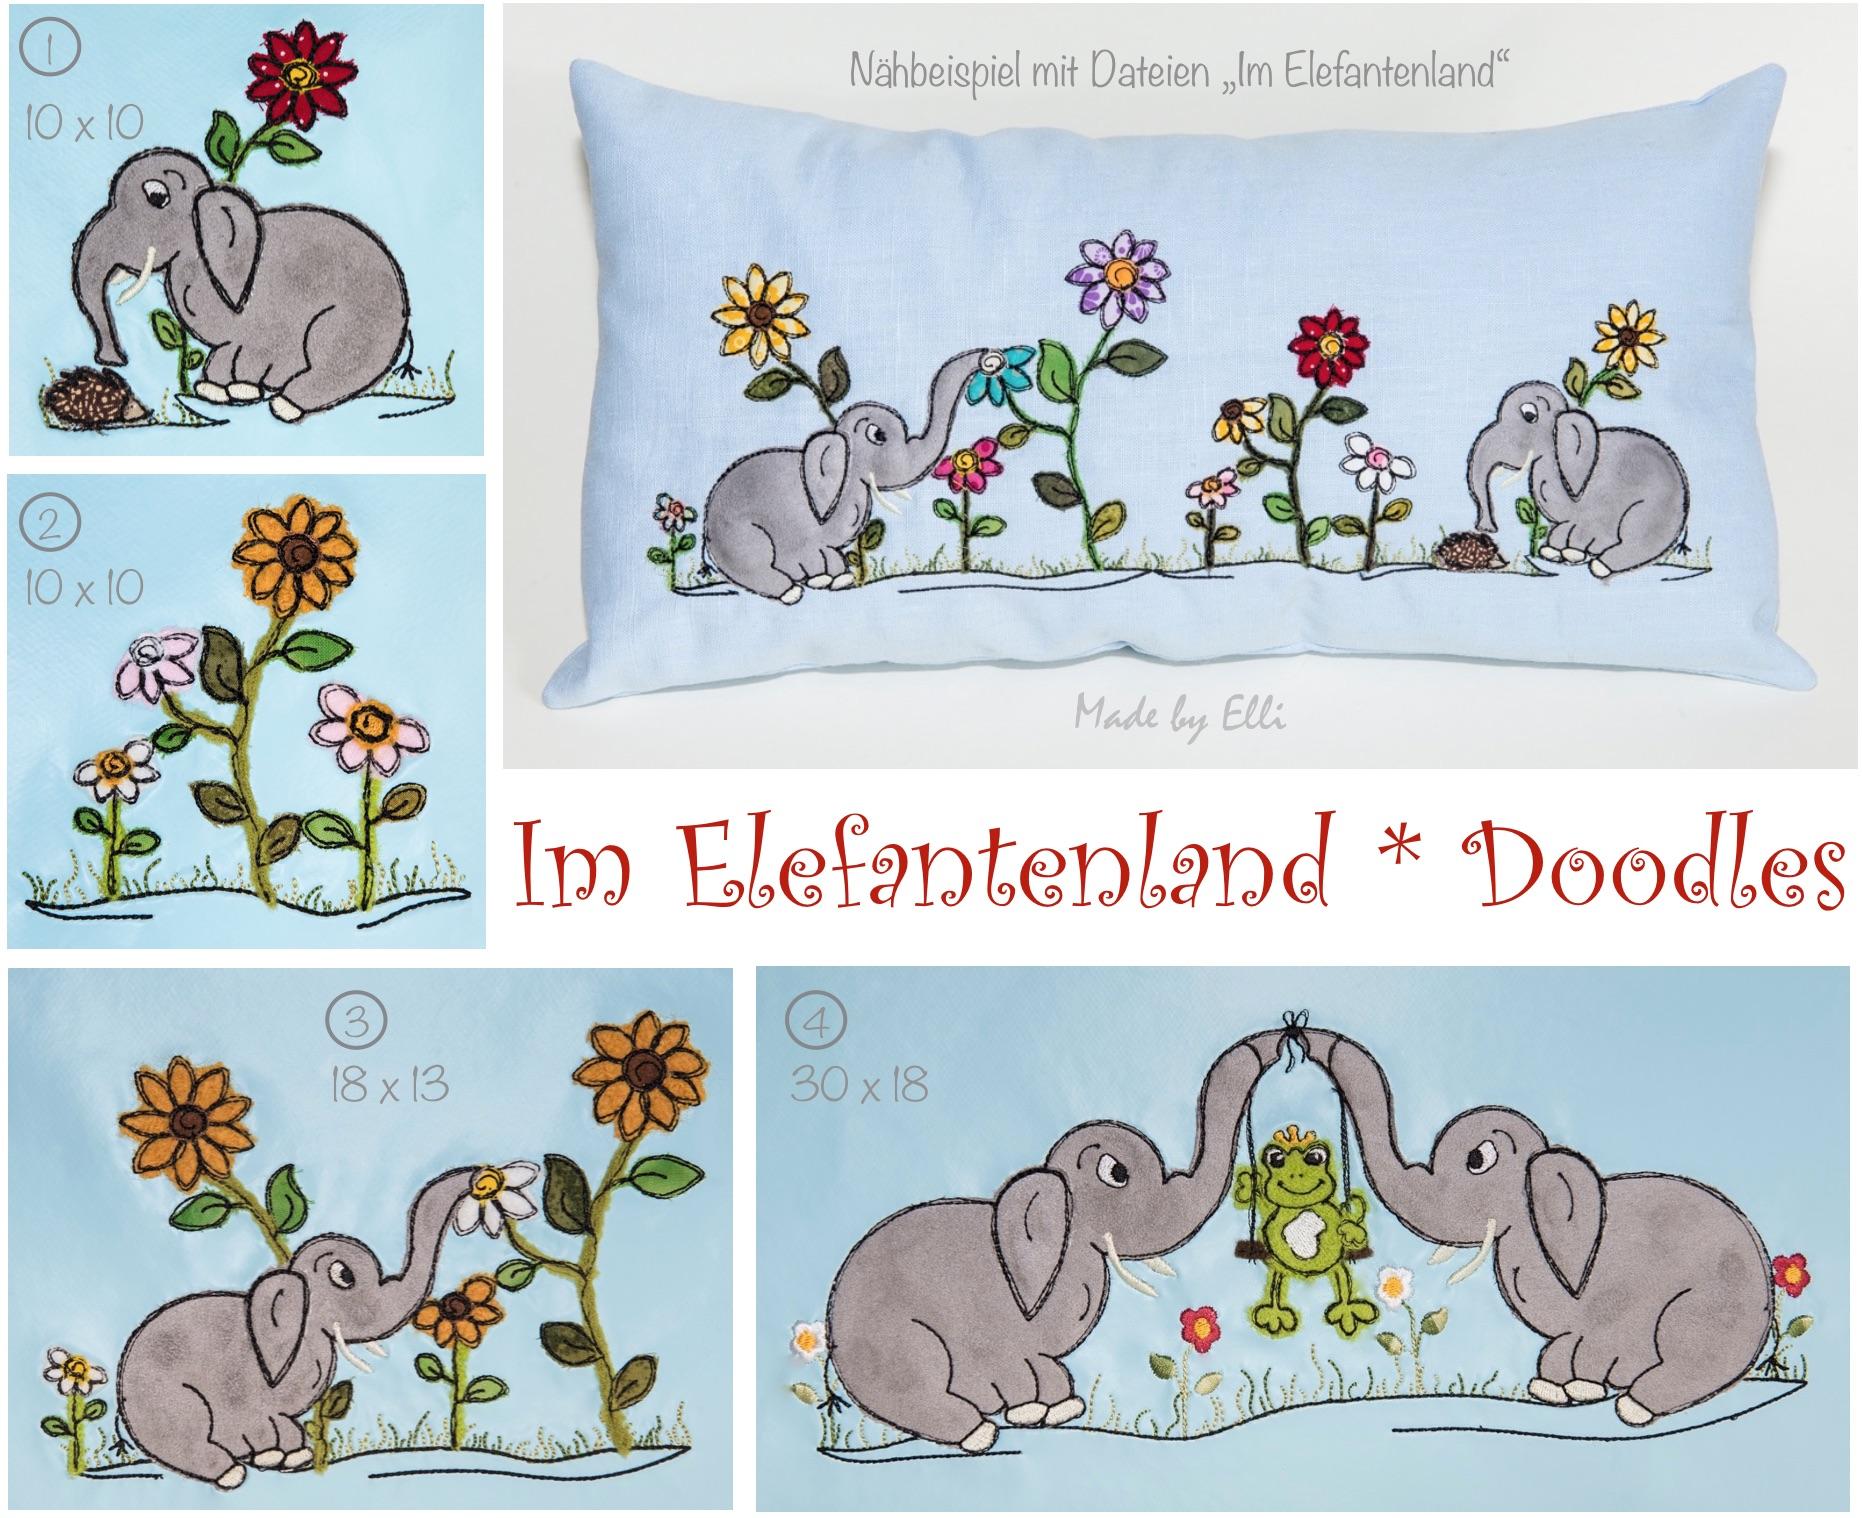 Im Elefantenland